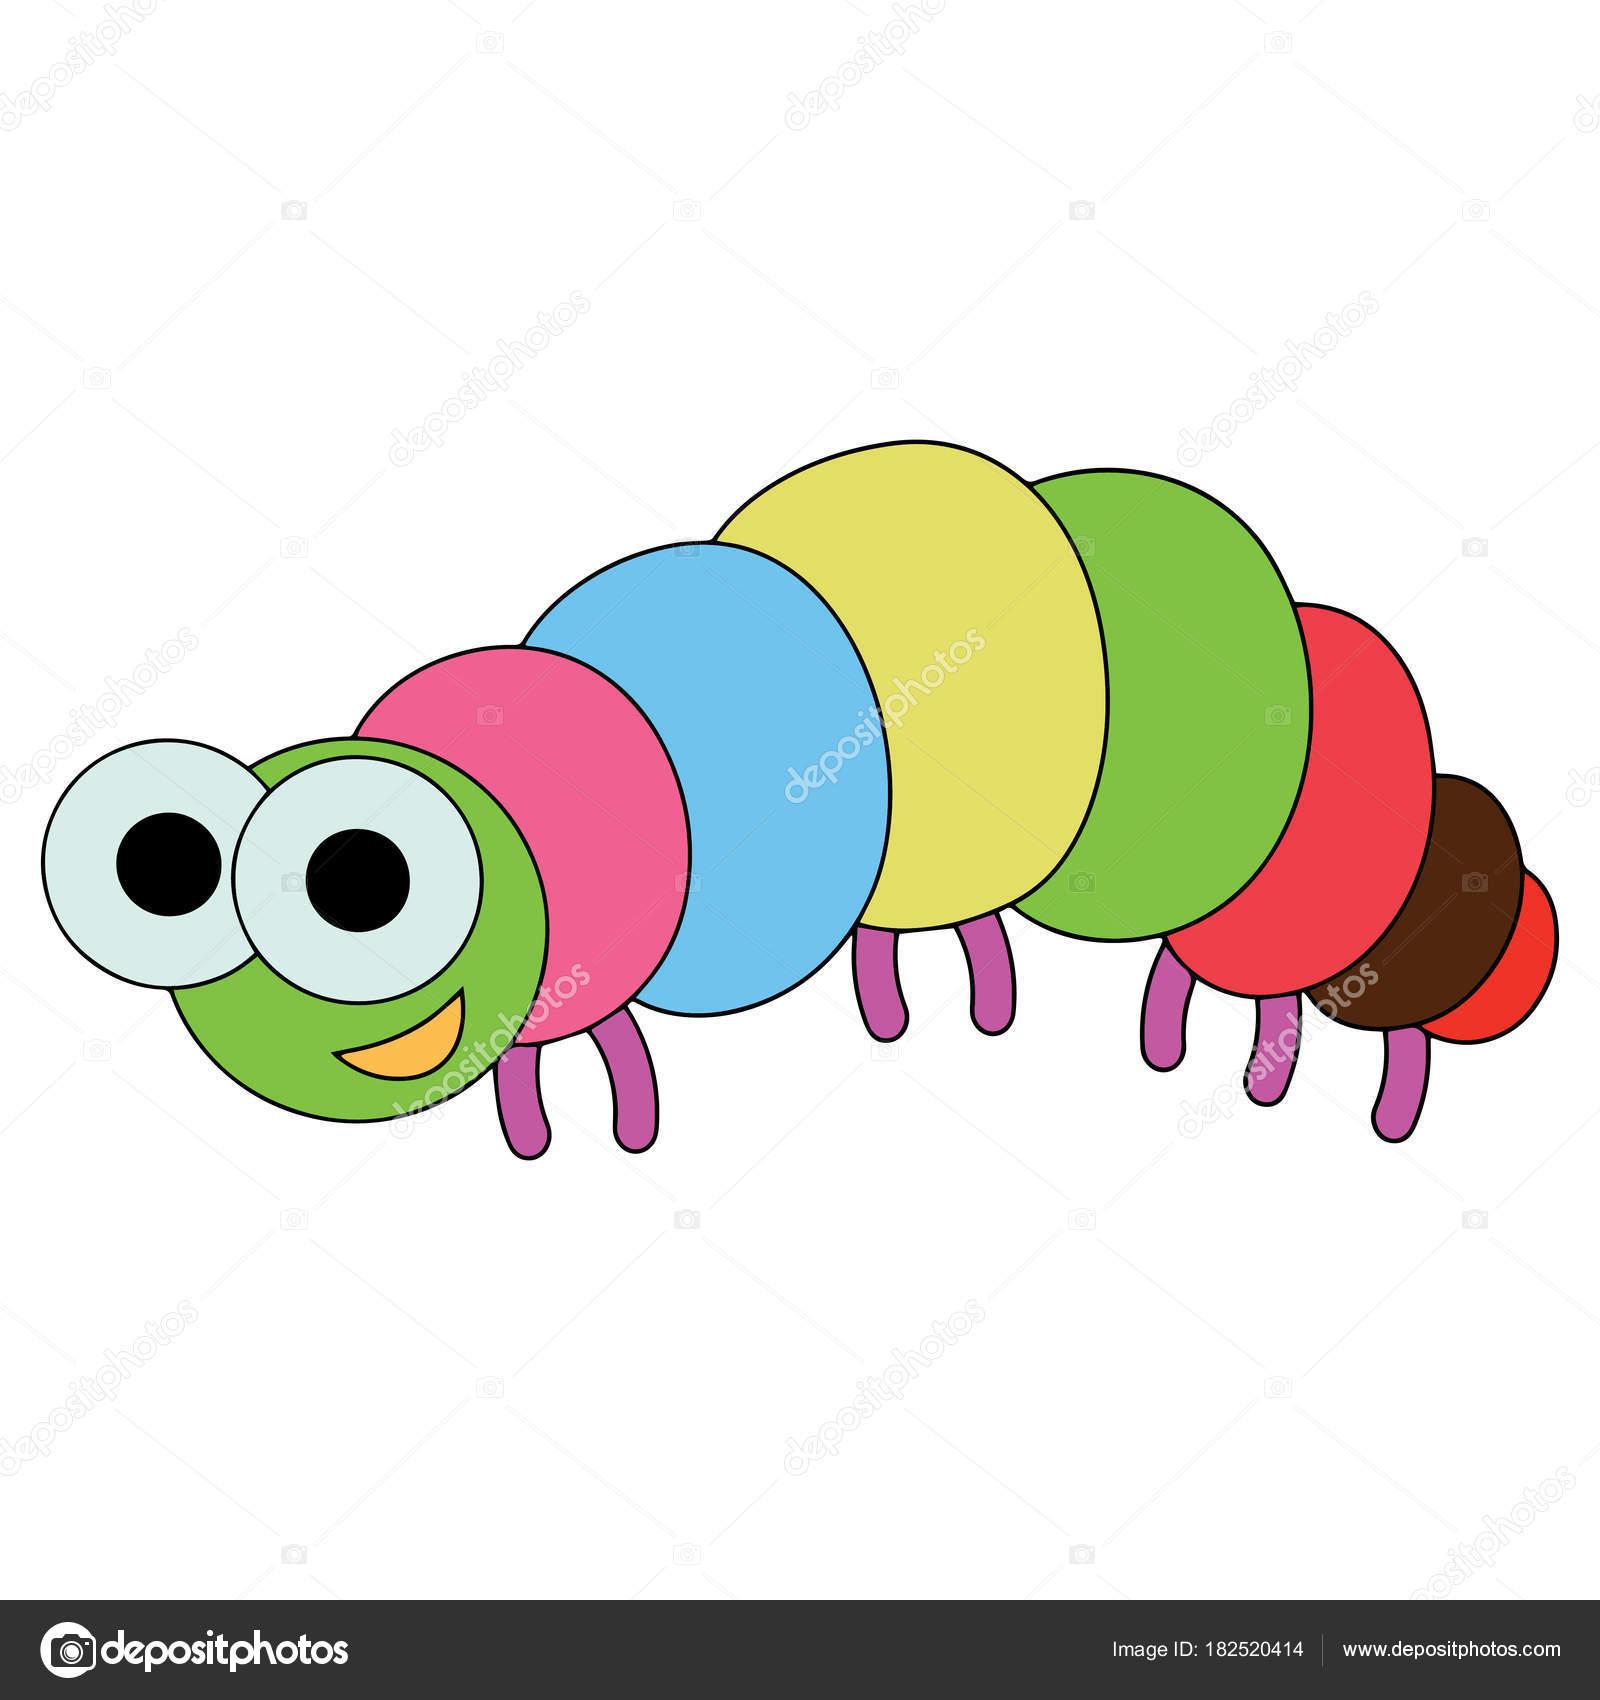 Cute Cartoon Caterpillar White Background Childrens Prints Shirt